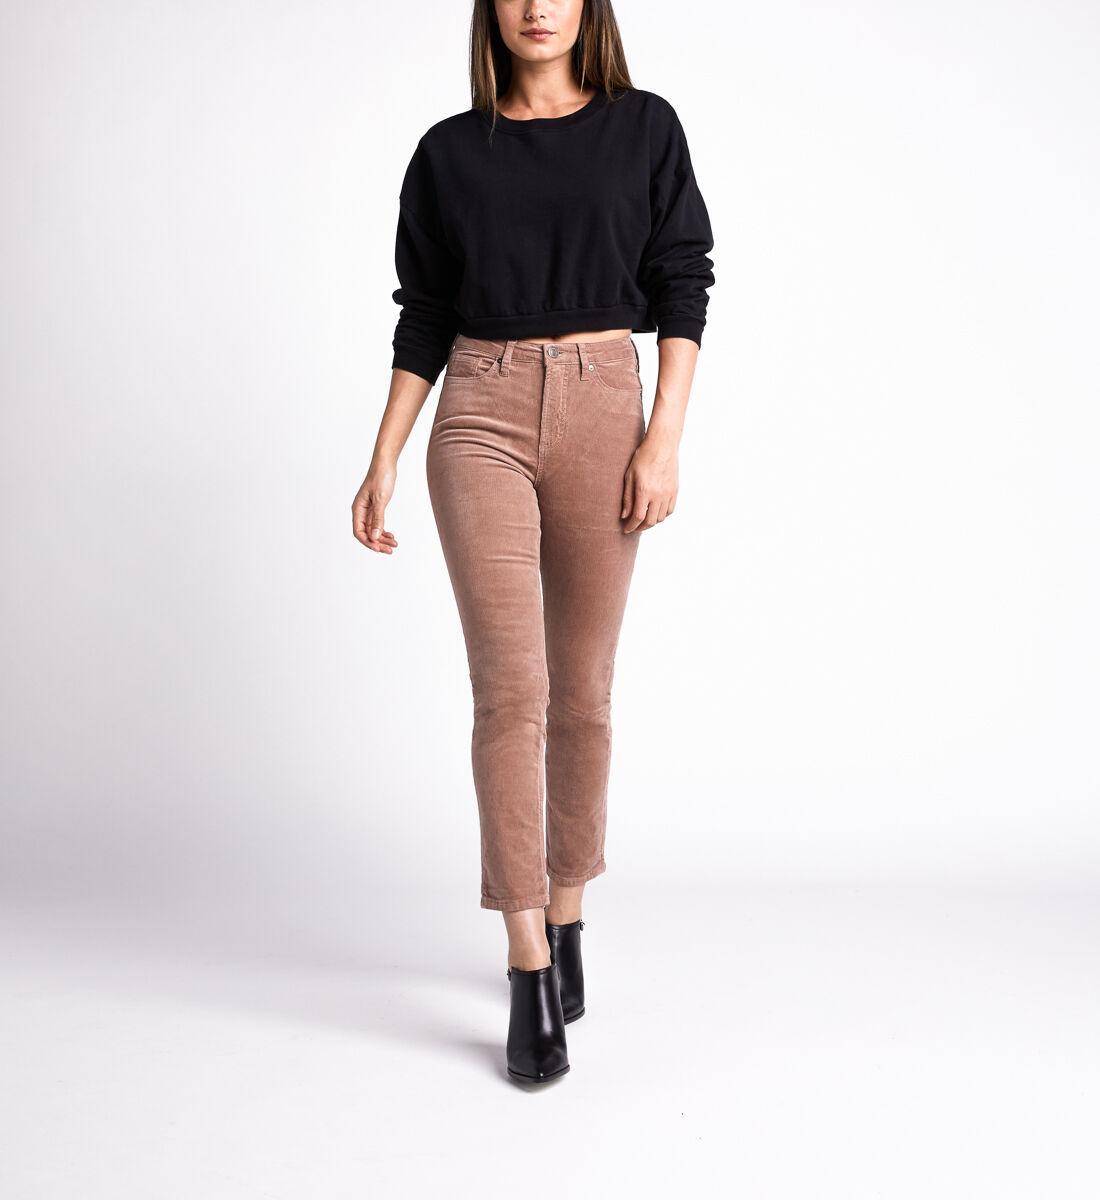 High Note High Rise Slim Leg Pants,Blush Front